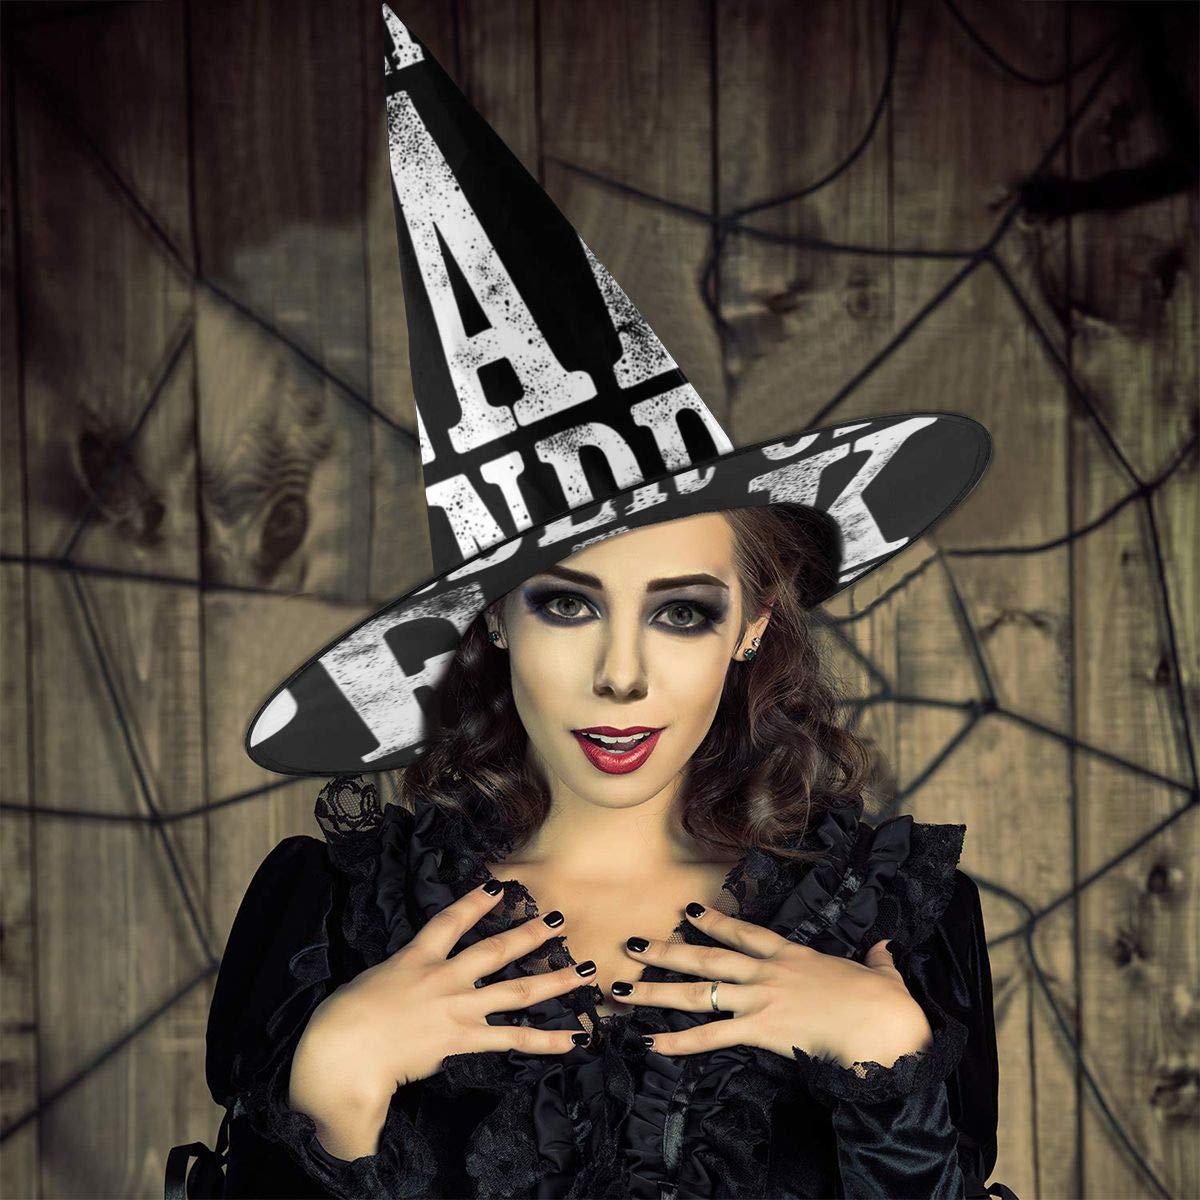 NUJSHF Orden de los Peaky Blinders Sombrero de Bruja Halloween ...